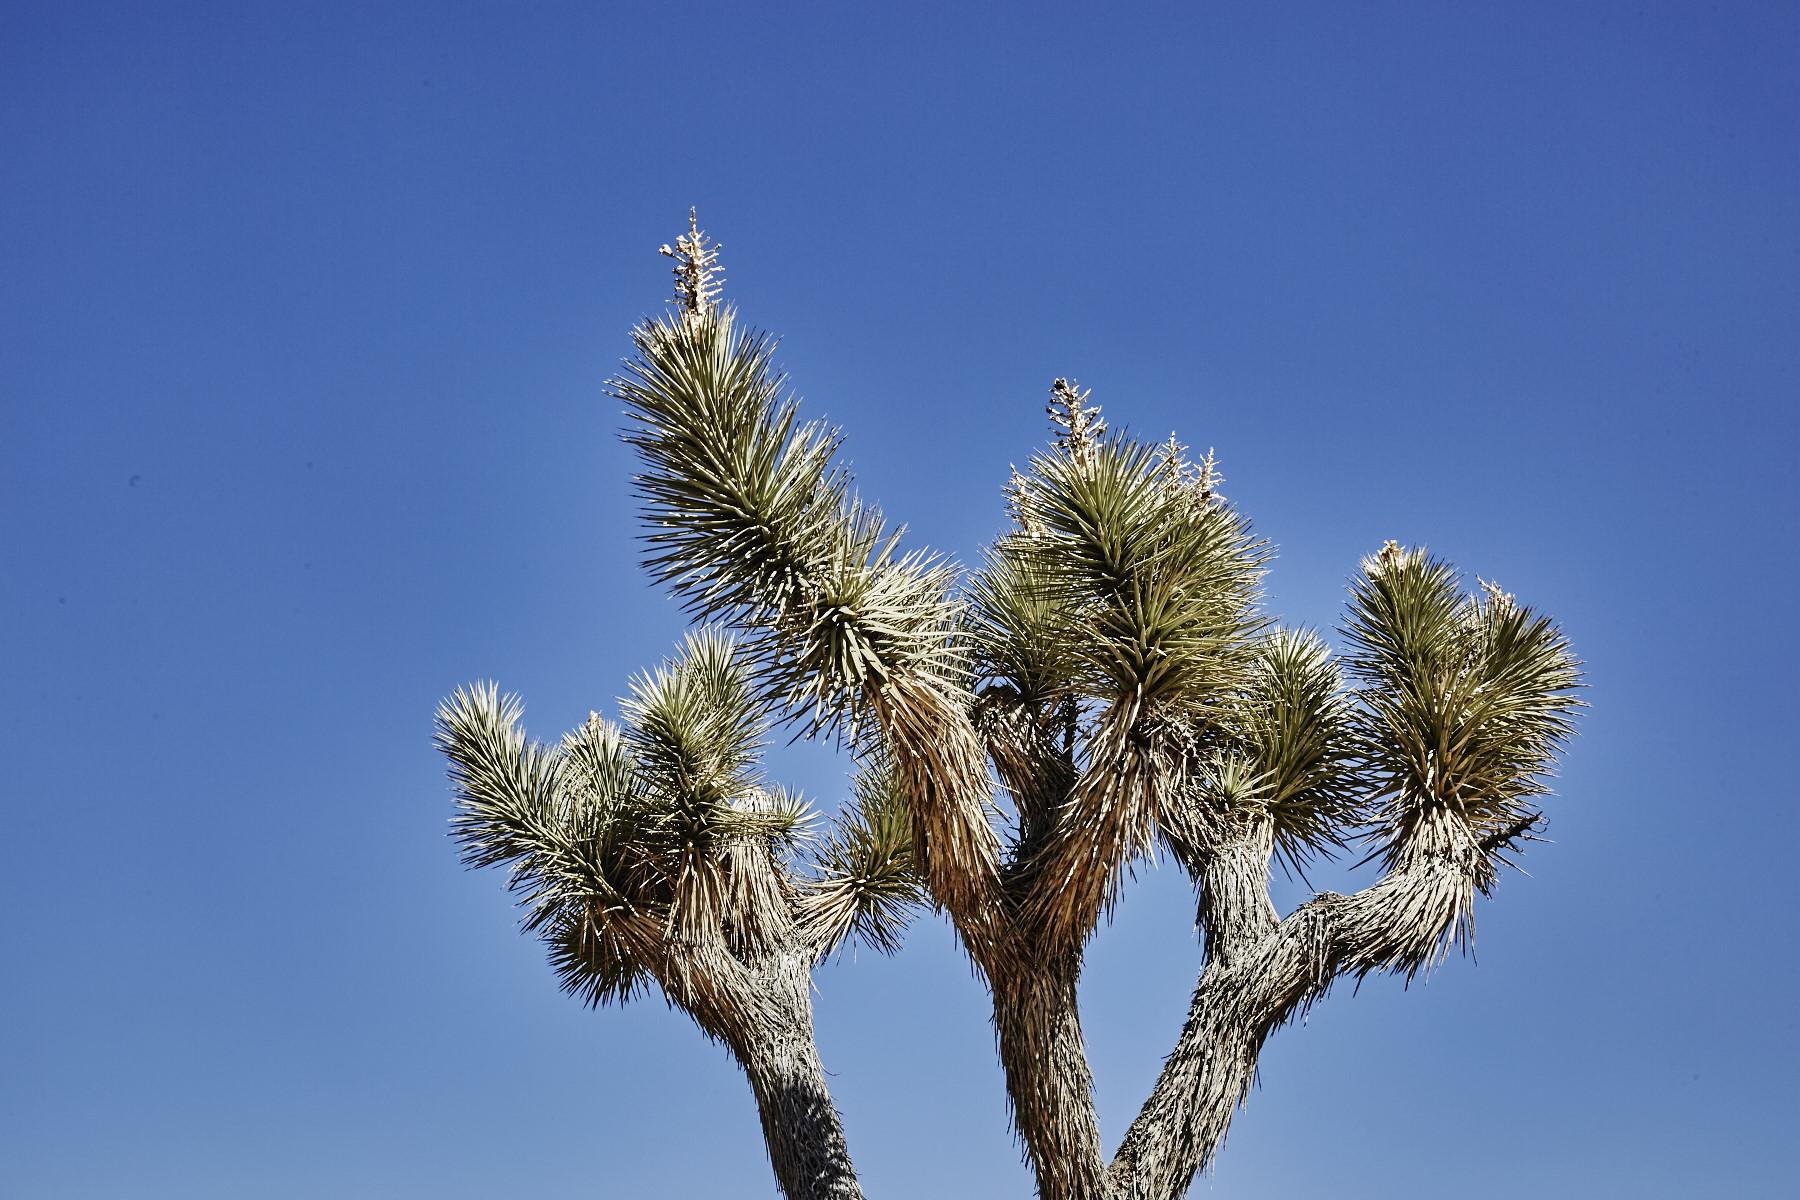 DAY TWO JOSHUA TREE